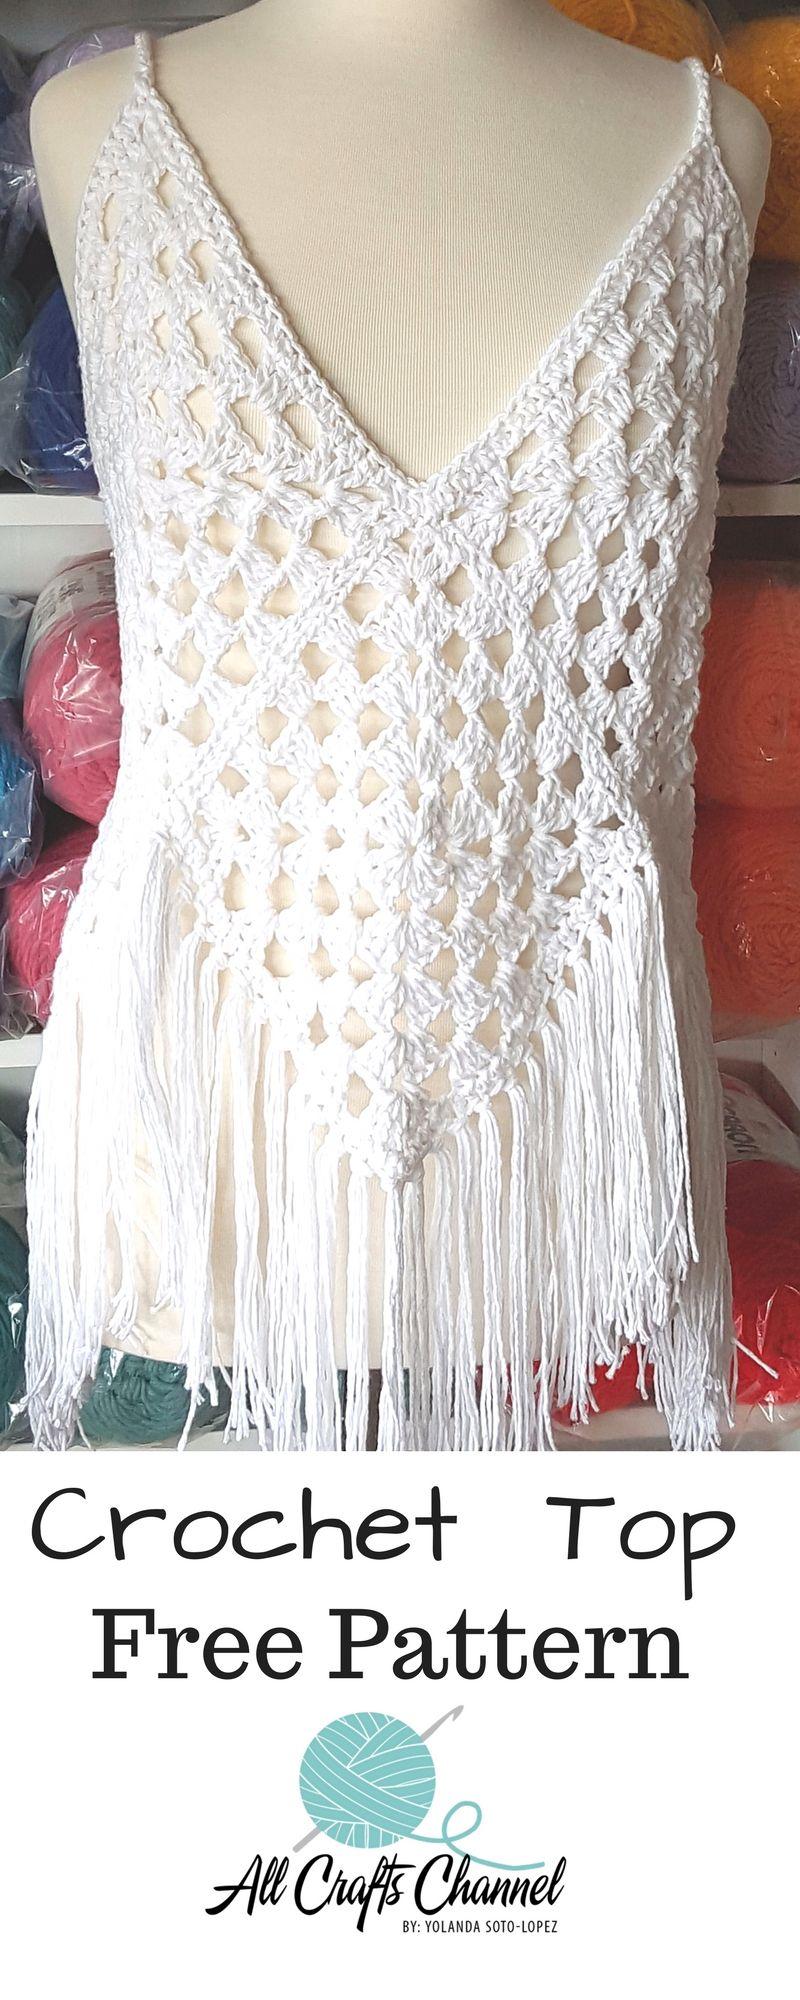 Easy, Breezy, Beautiful Crochet Top | Tejido, Blusas y Ganchillo